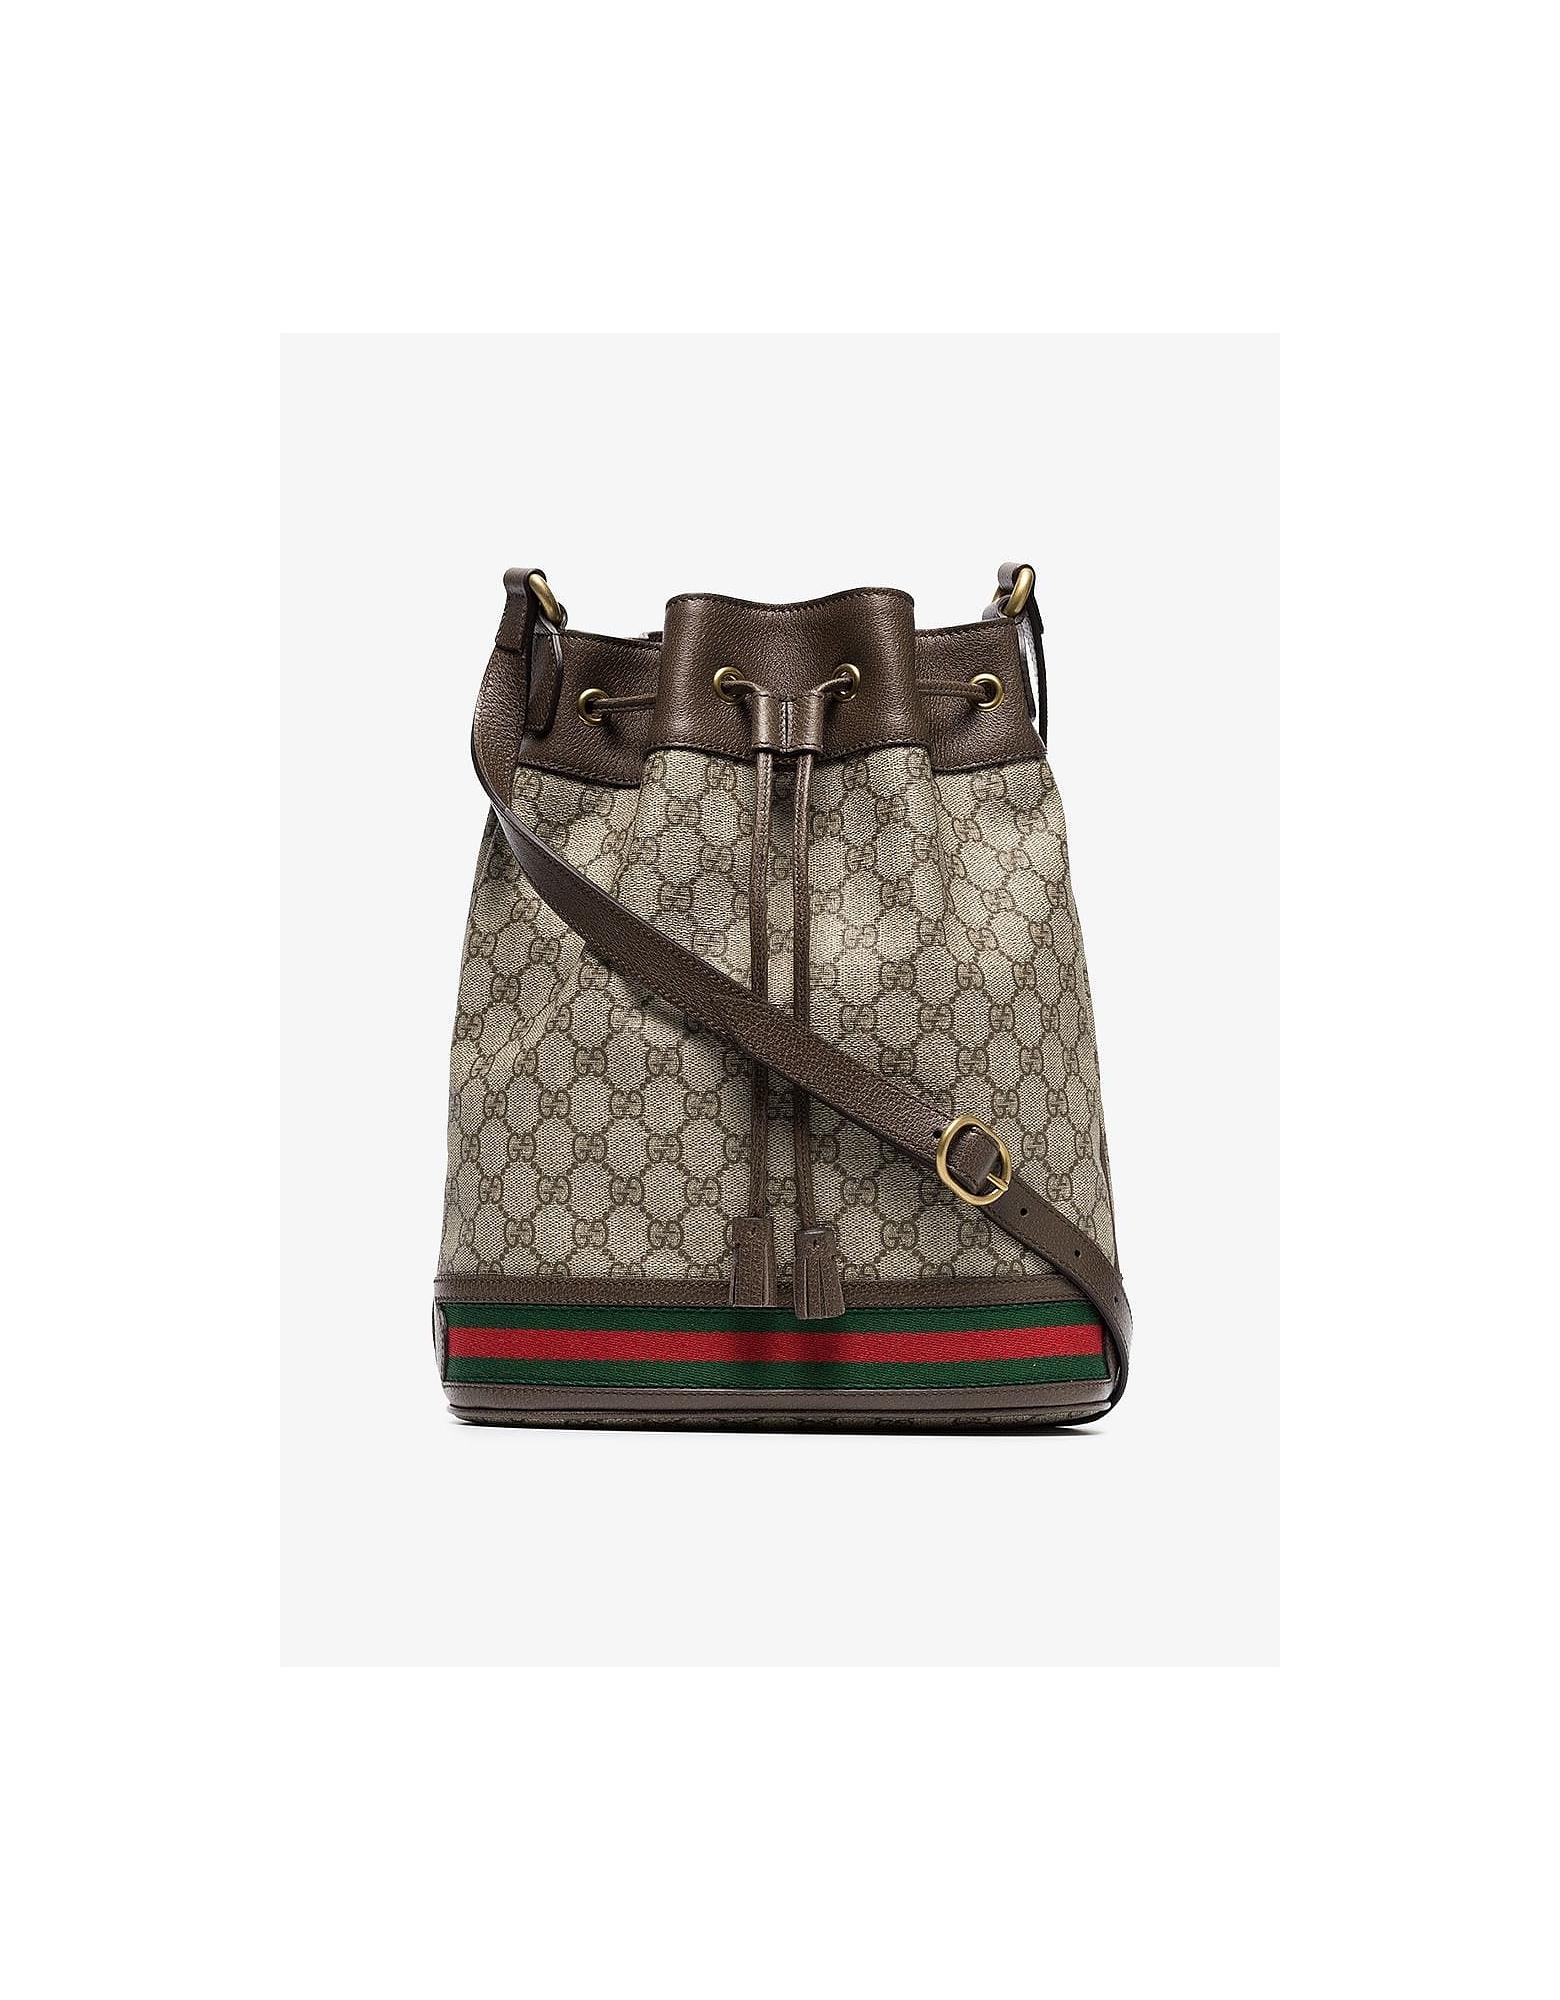 Gucci Bags GG LOGO BUCKET BAG